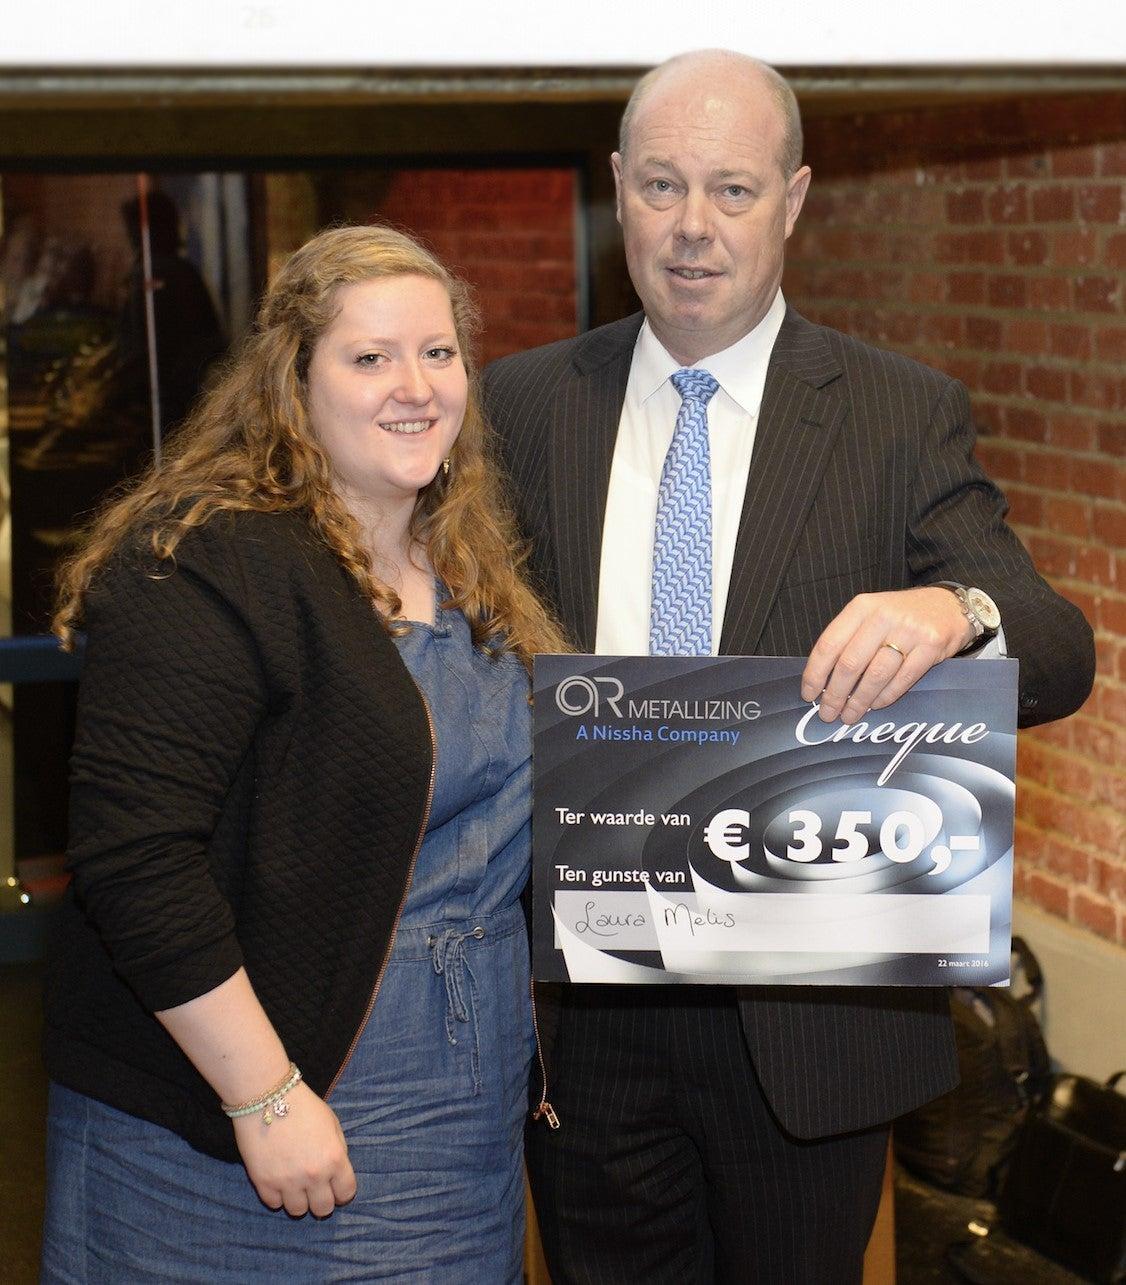 Laura Melis with AR Metallizing CEO Bart Devos